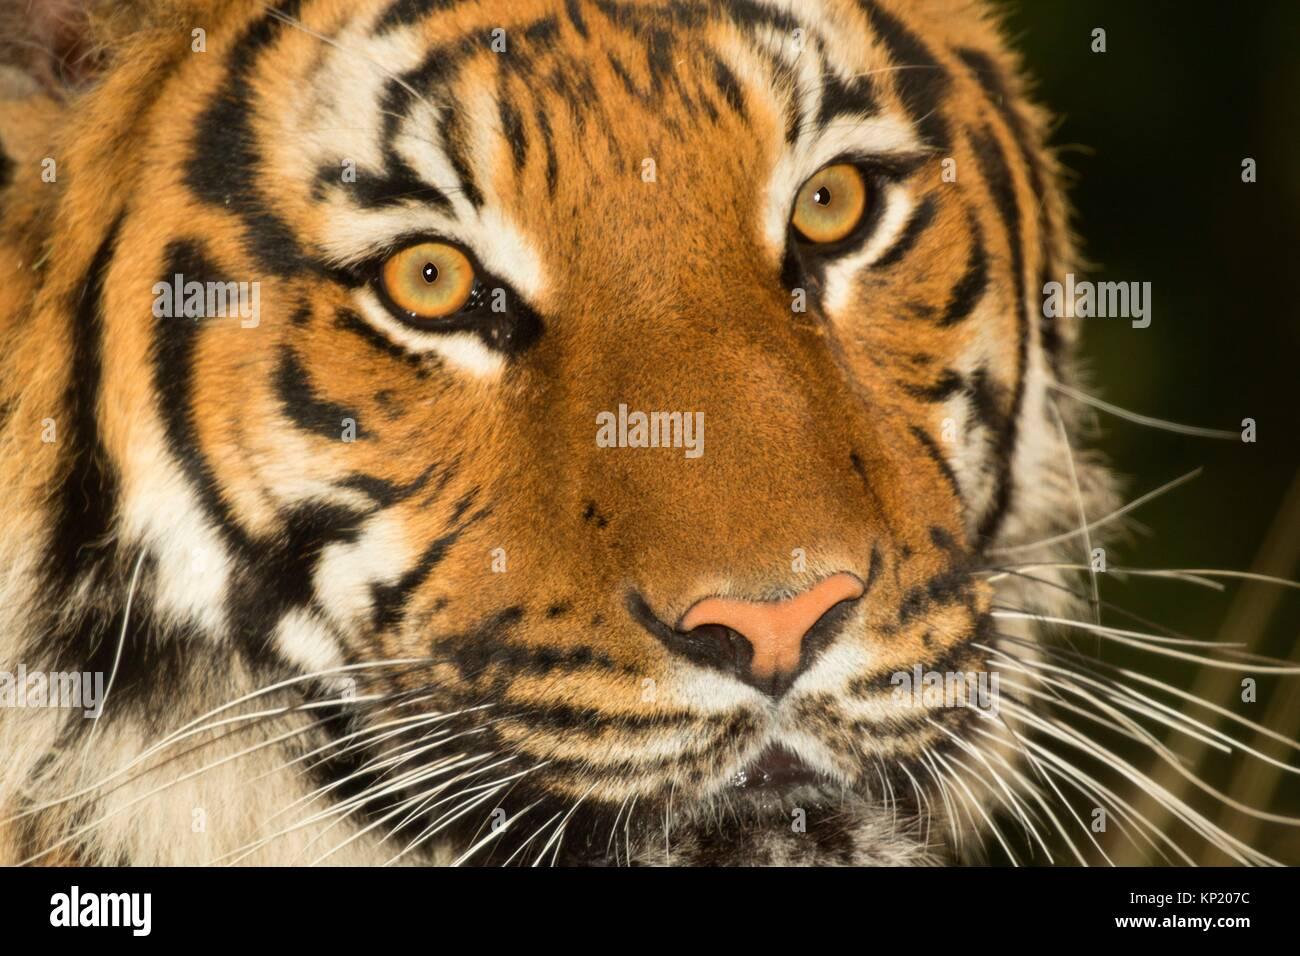 Malayan tiger, Woodland Park Zoo, Seattle, Washington. Stock Photo